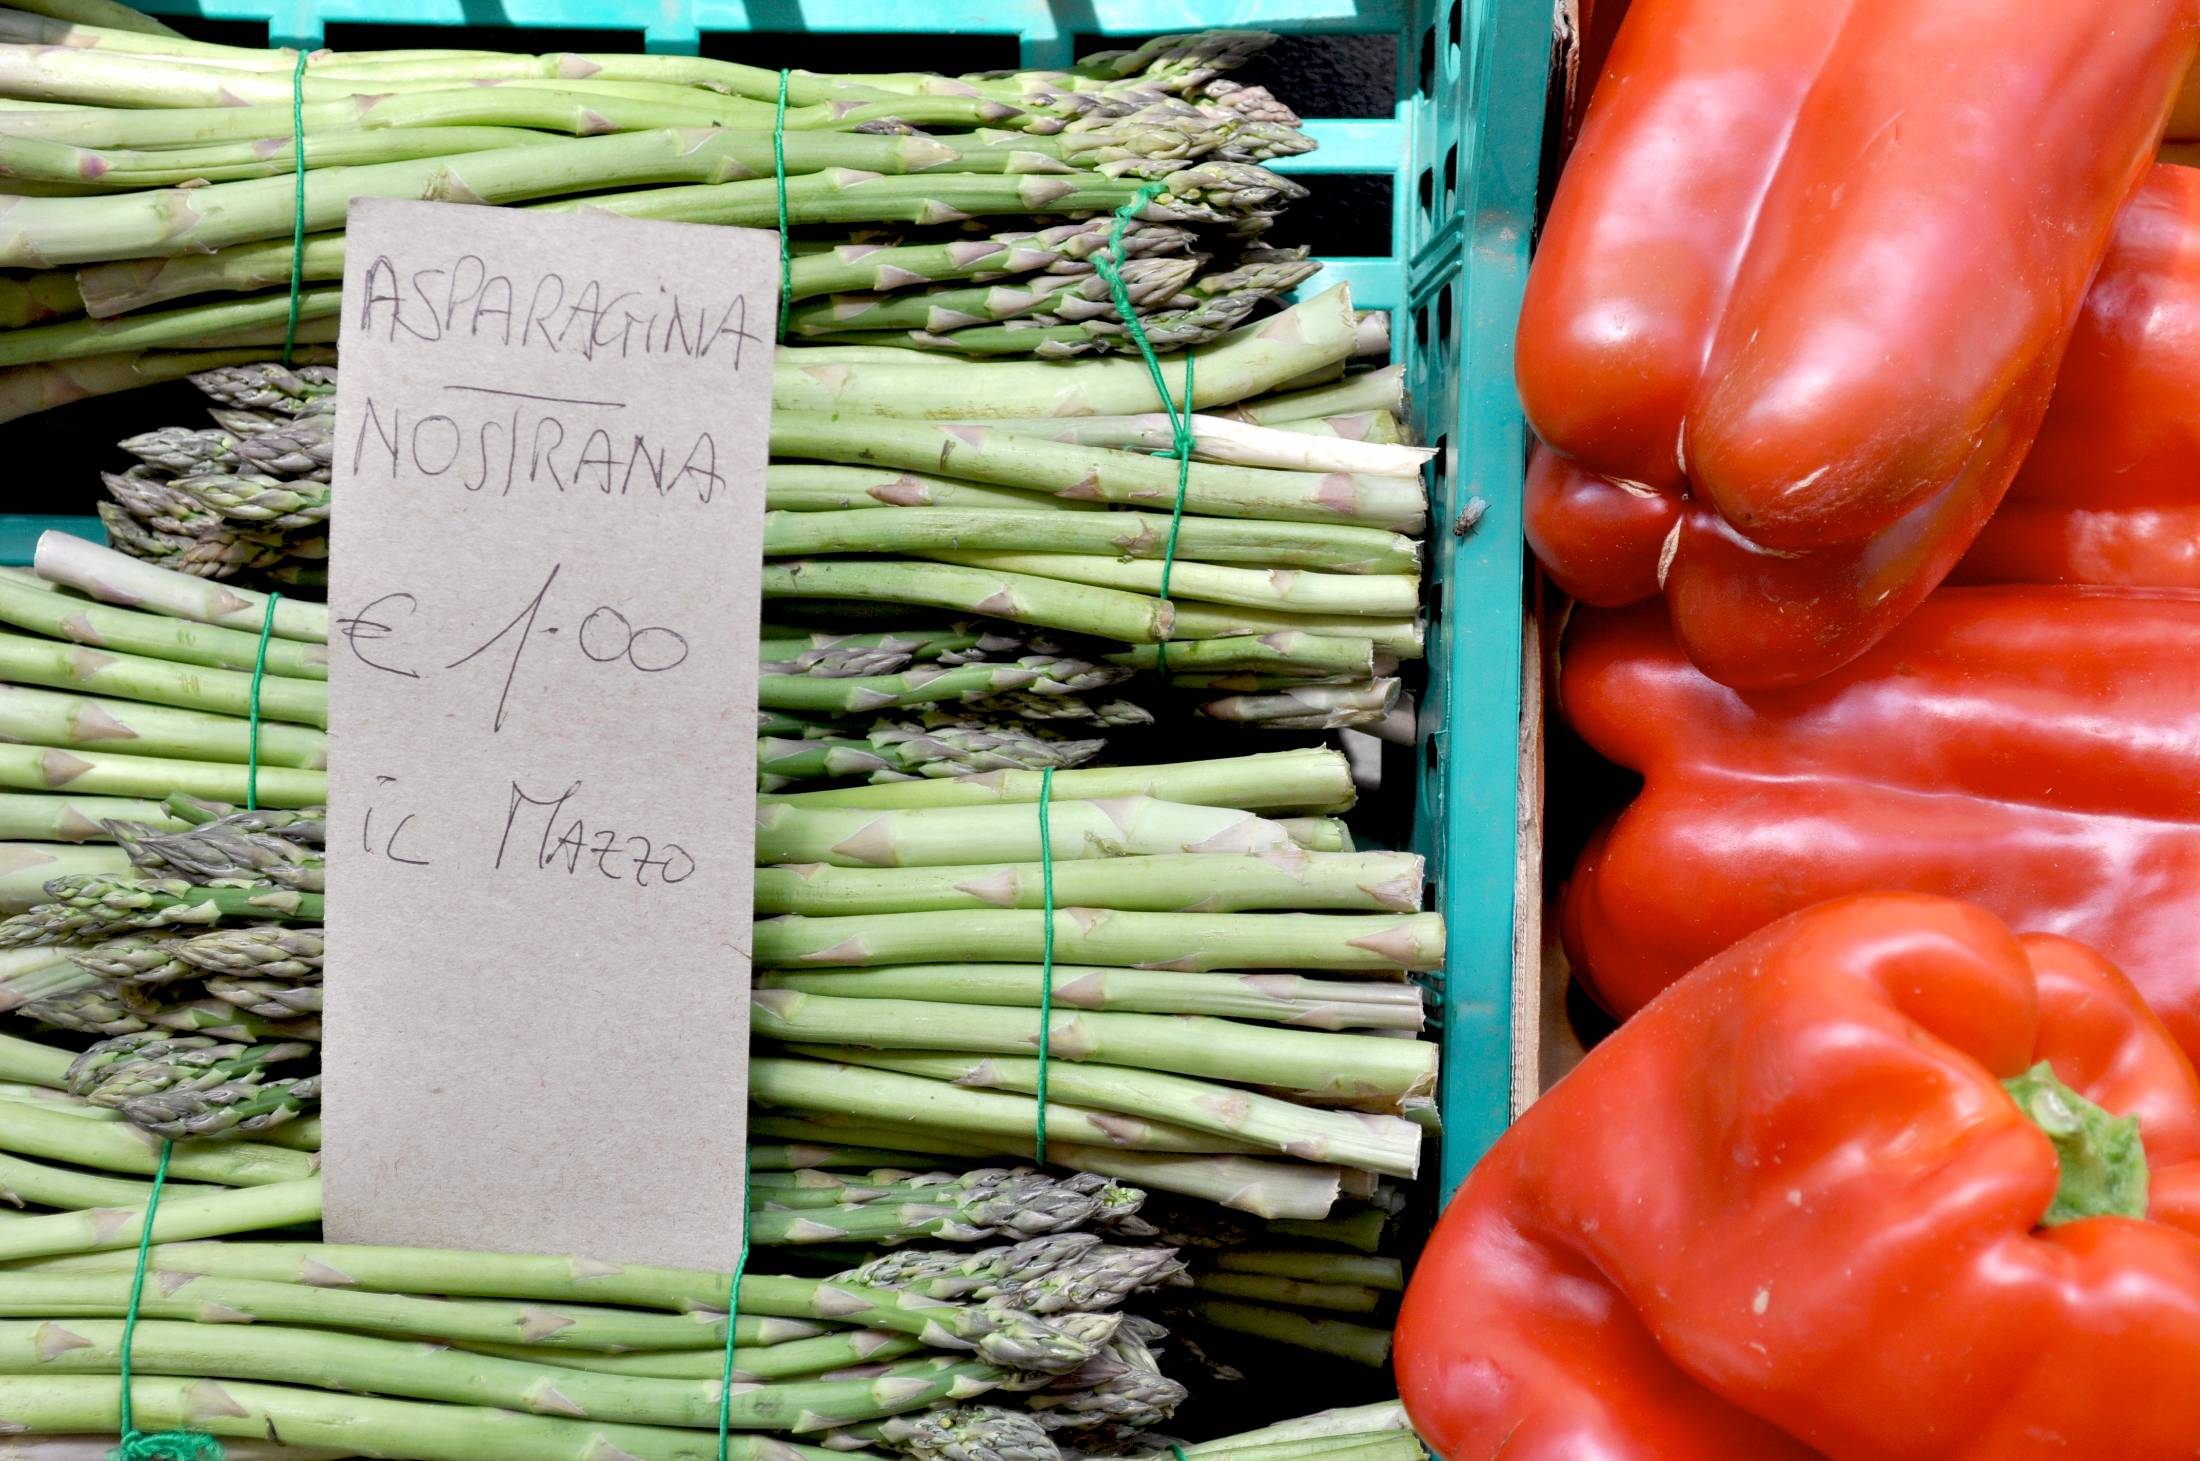 Fresh vegetables from Florence market